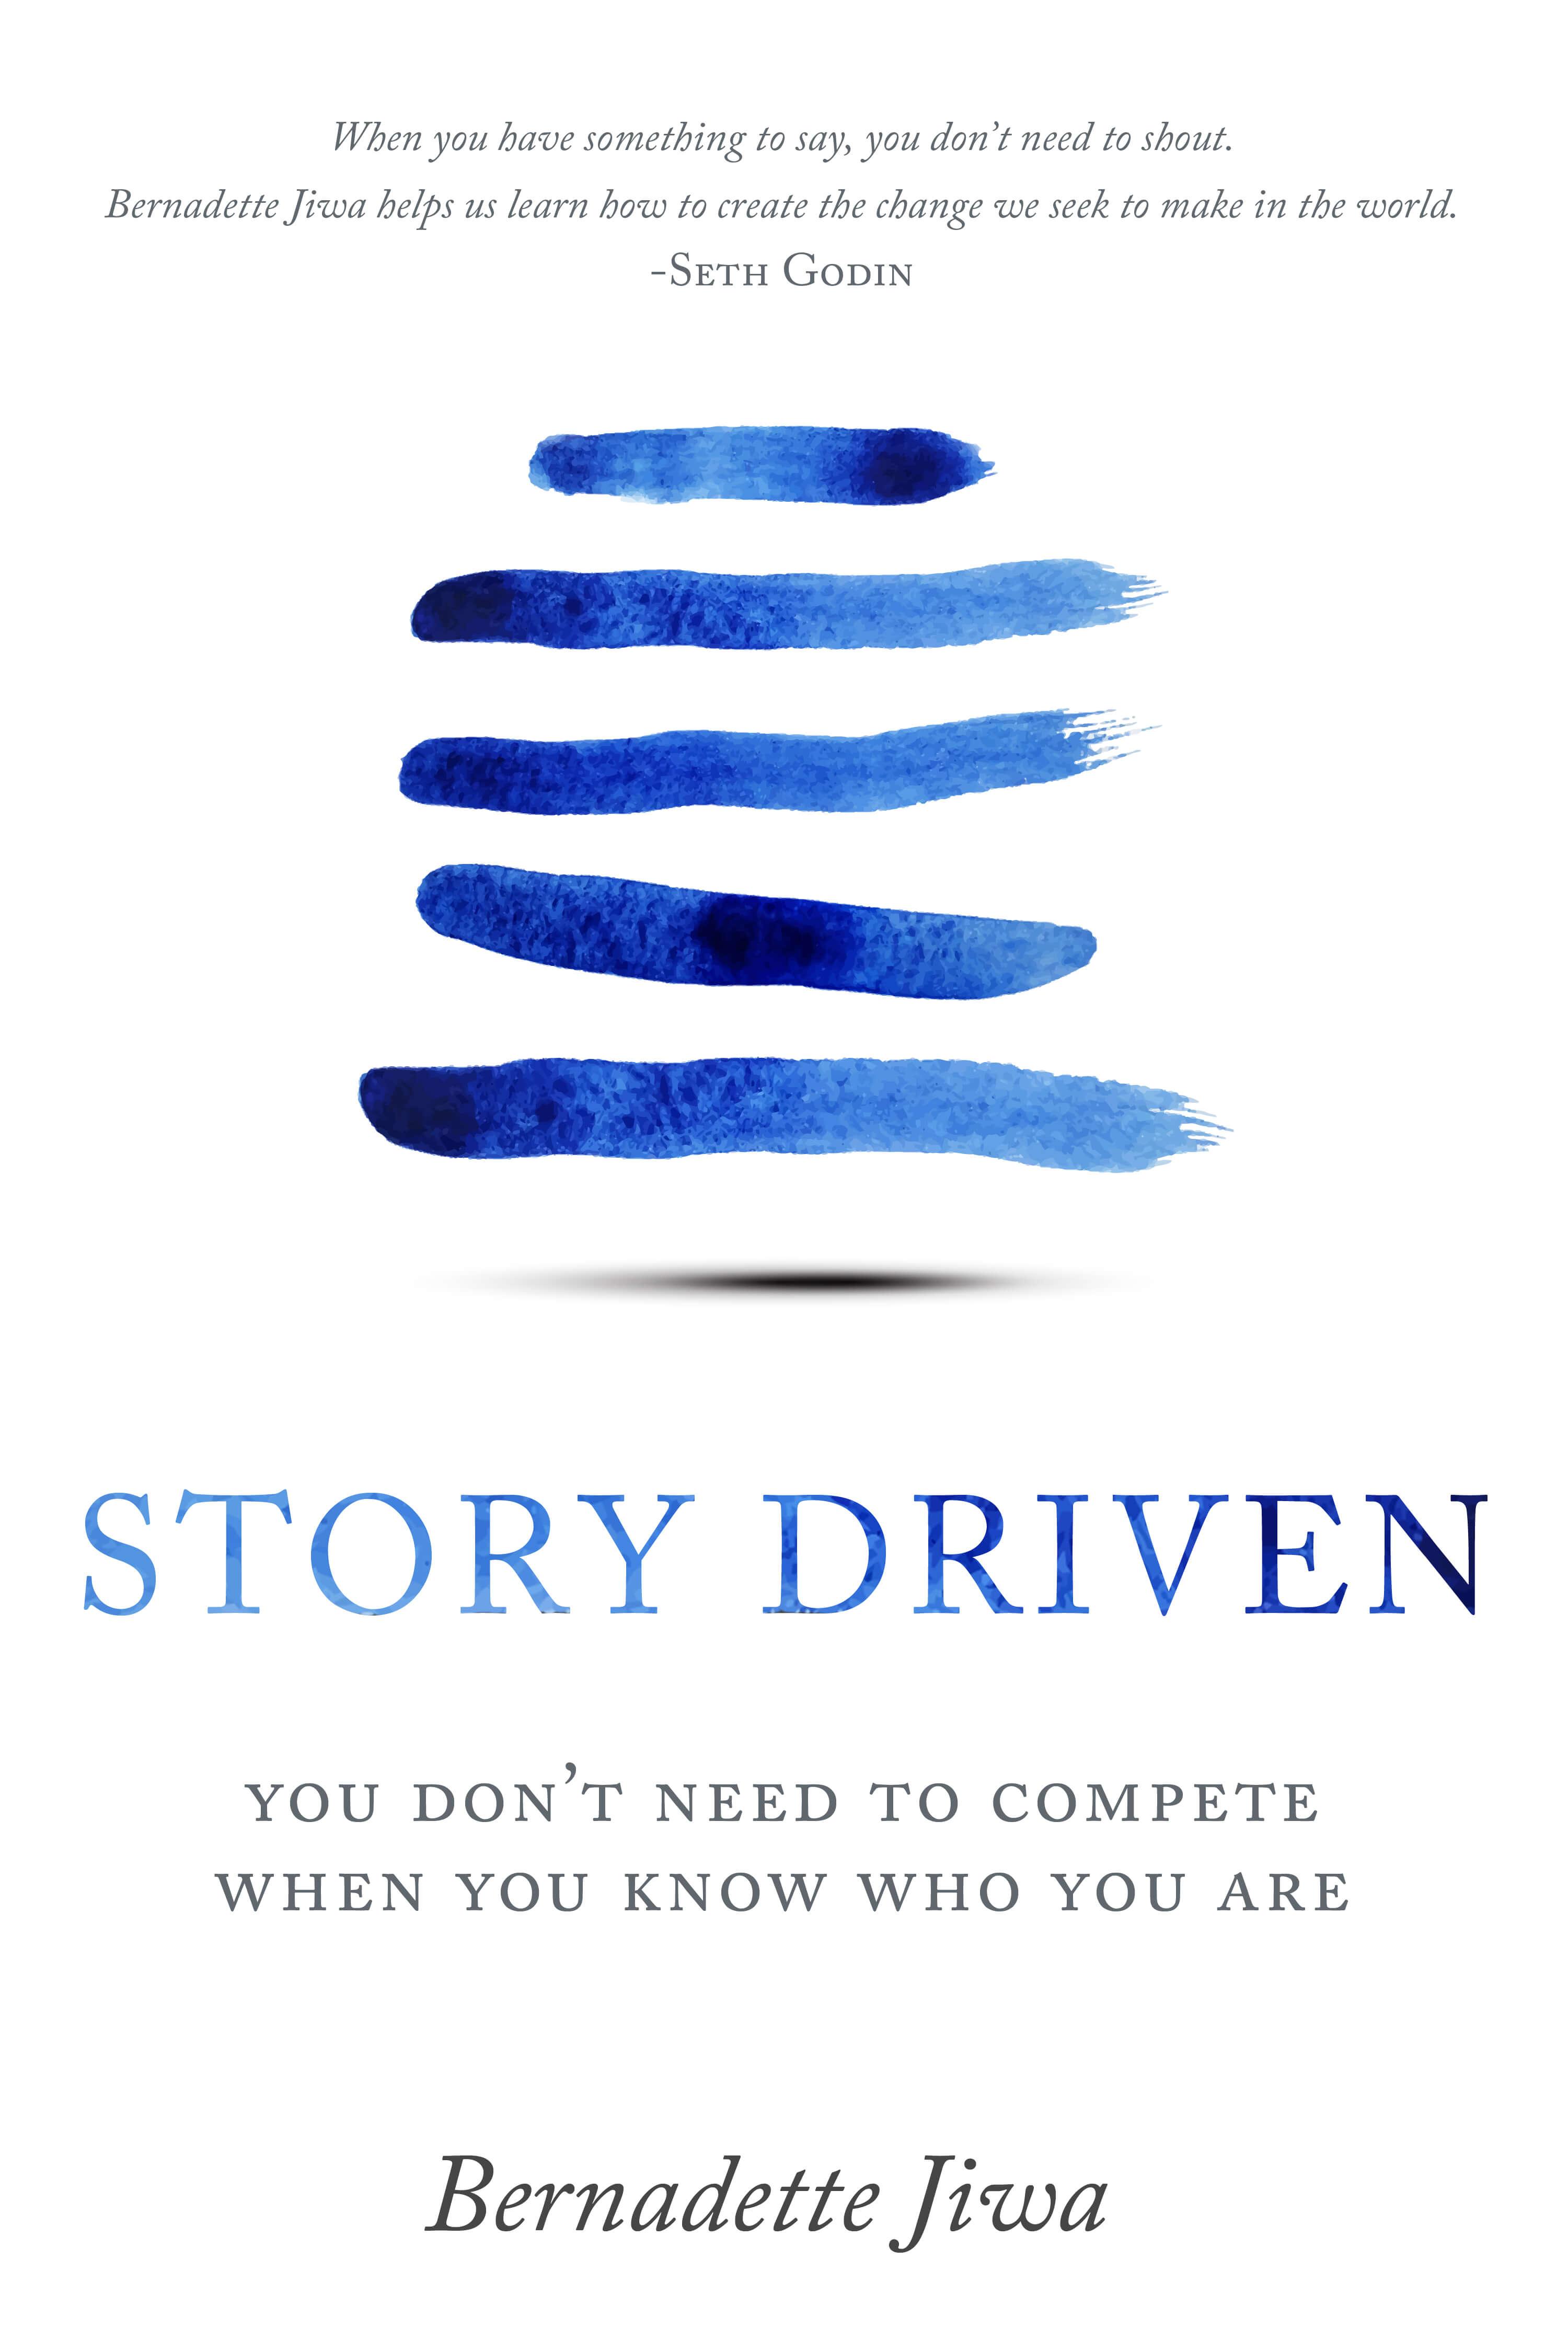 Story Driven (Bernadette Jiwa)